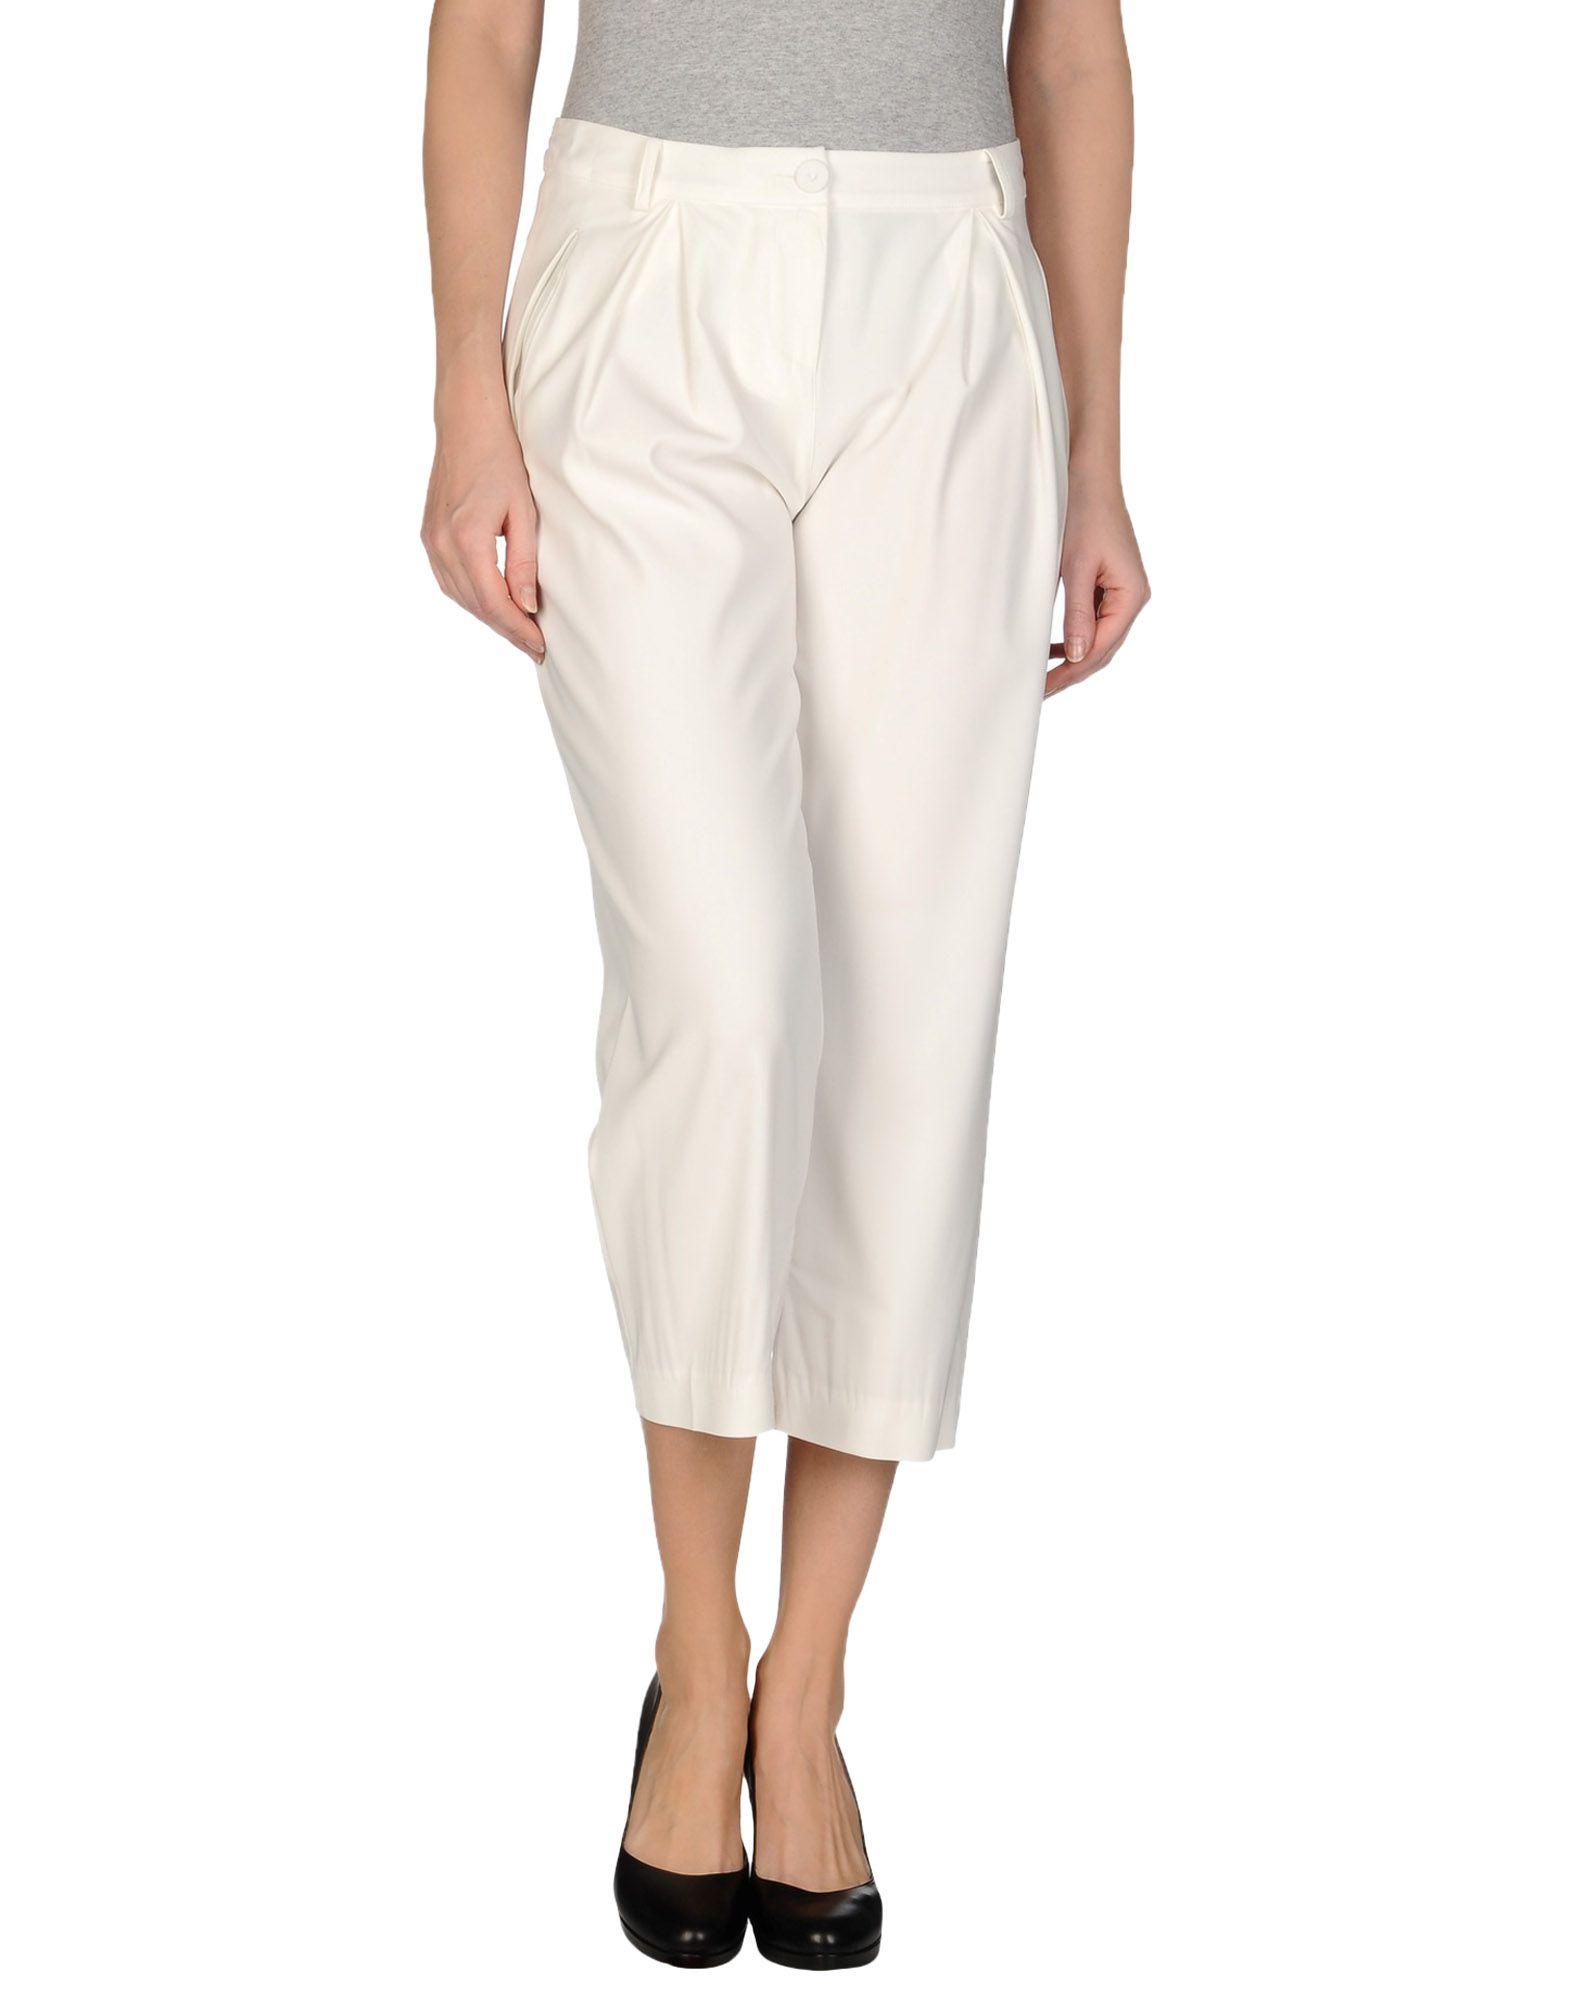 Creative Trespass WomensLadies Kapaa Short Length Casual Shorts